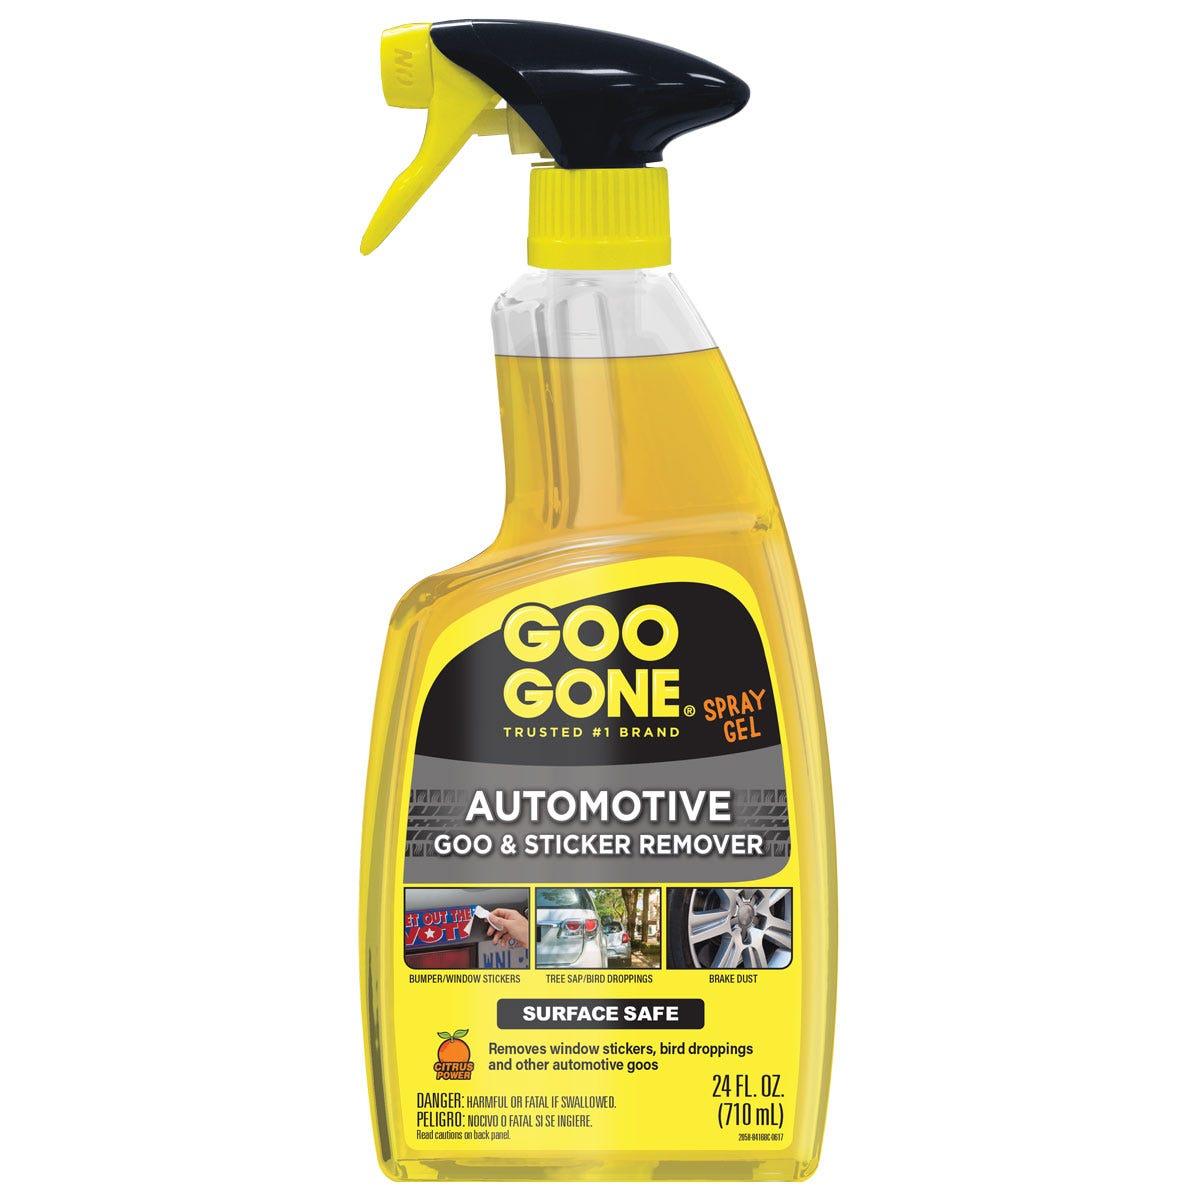 https://googone.com/media/catalog/product/g/o/goo-gone-automotive-spray_front_2.jpg